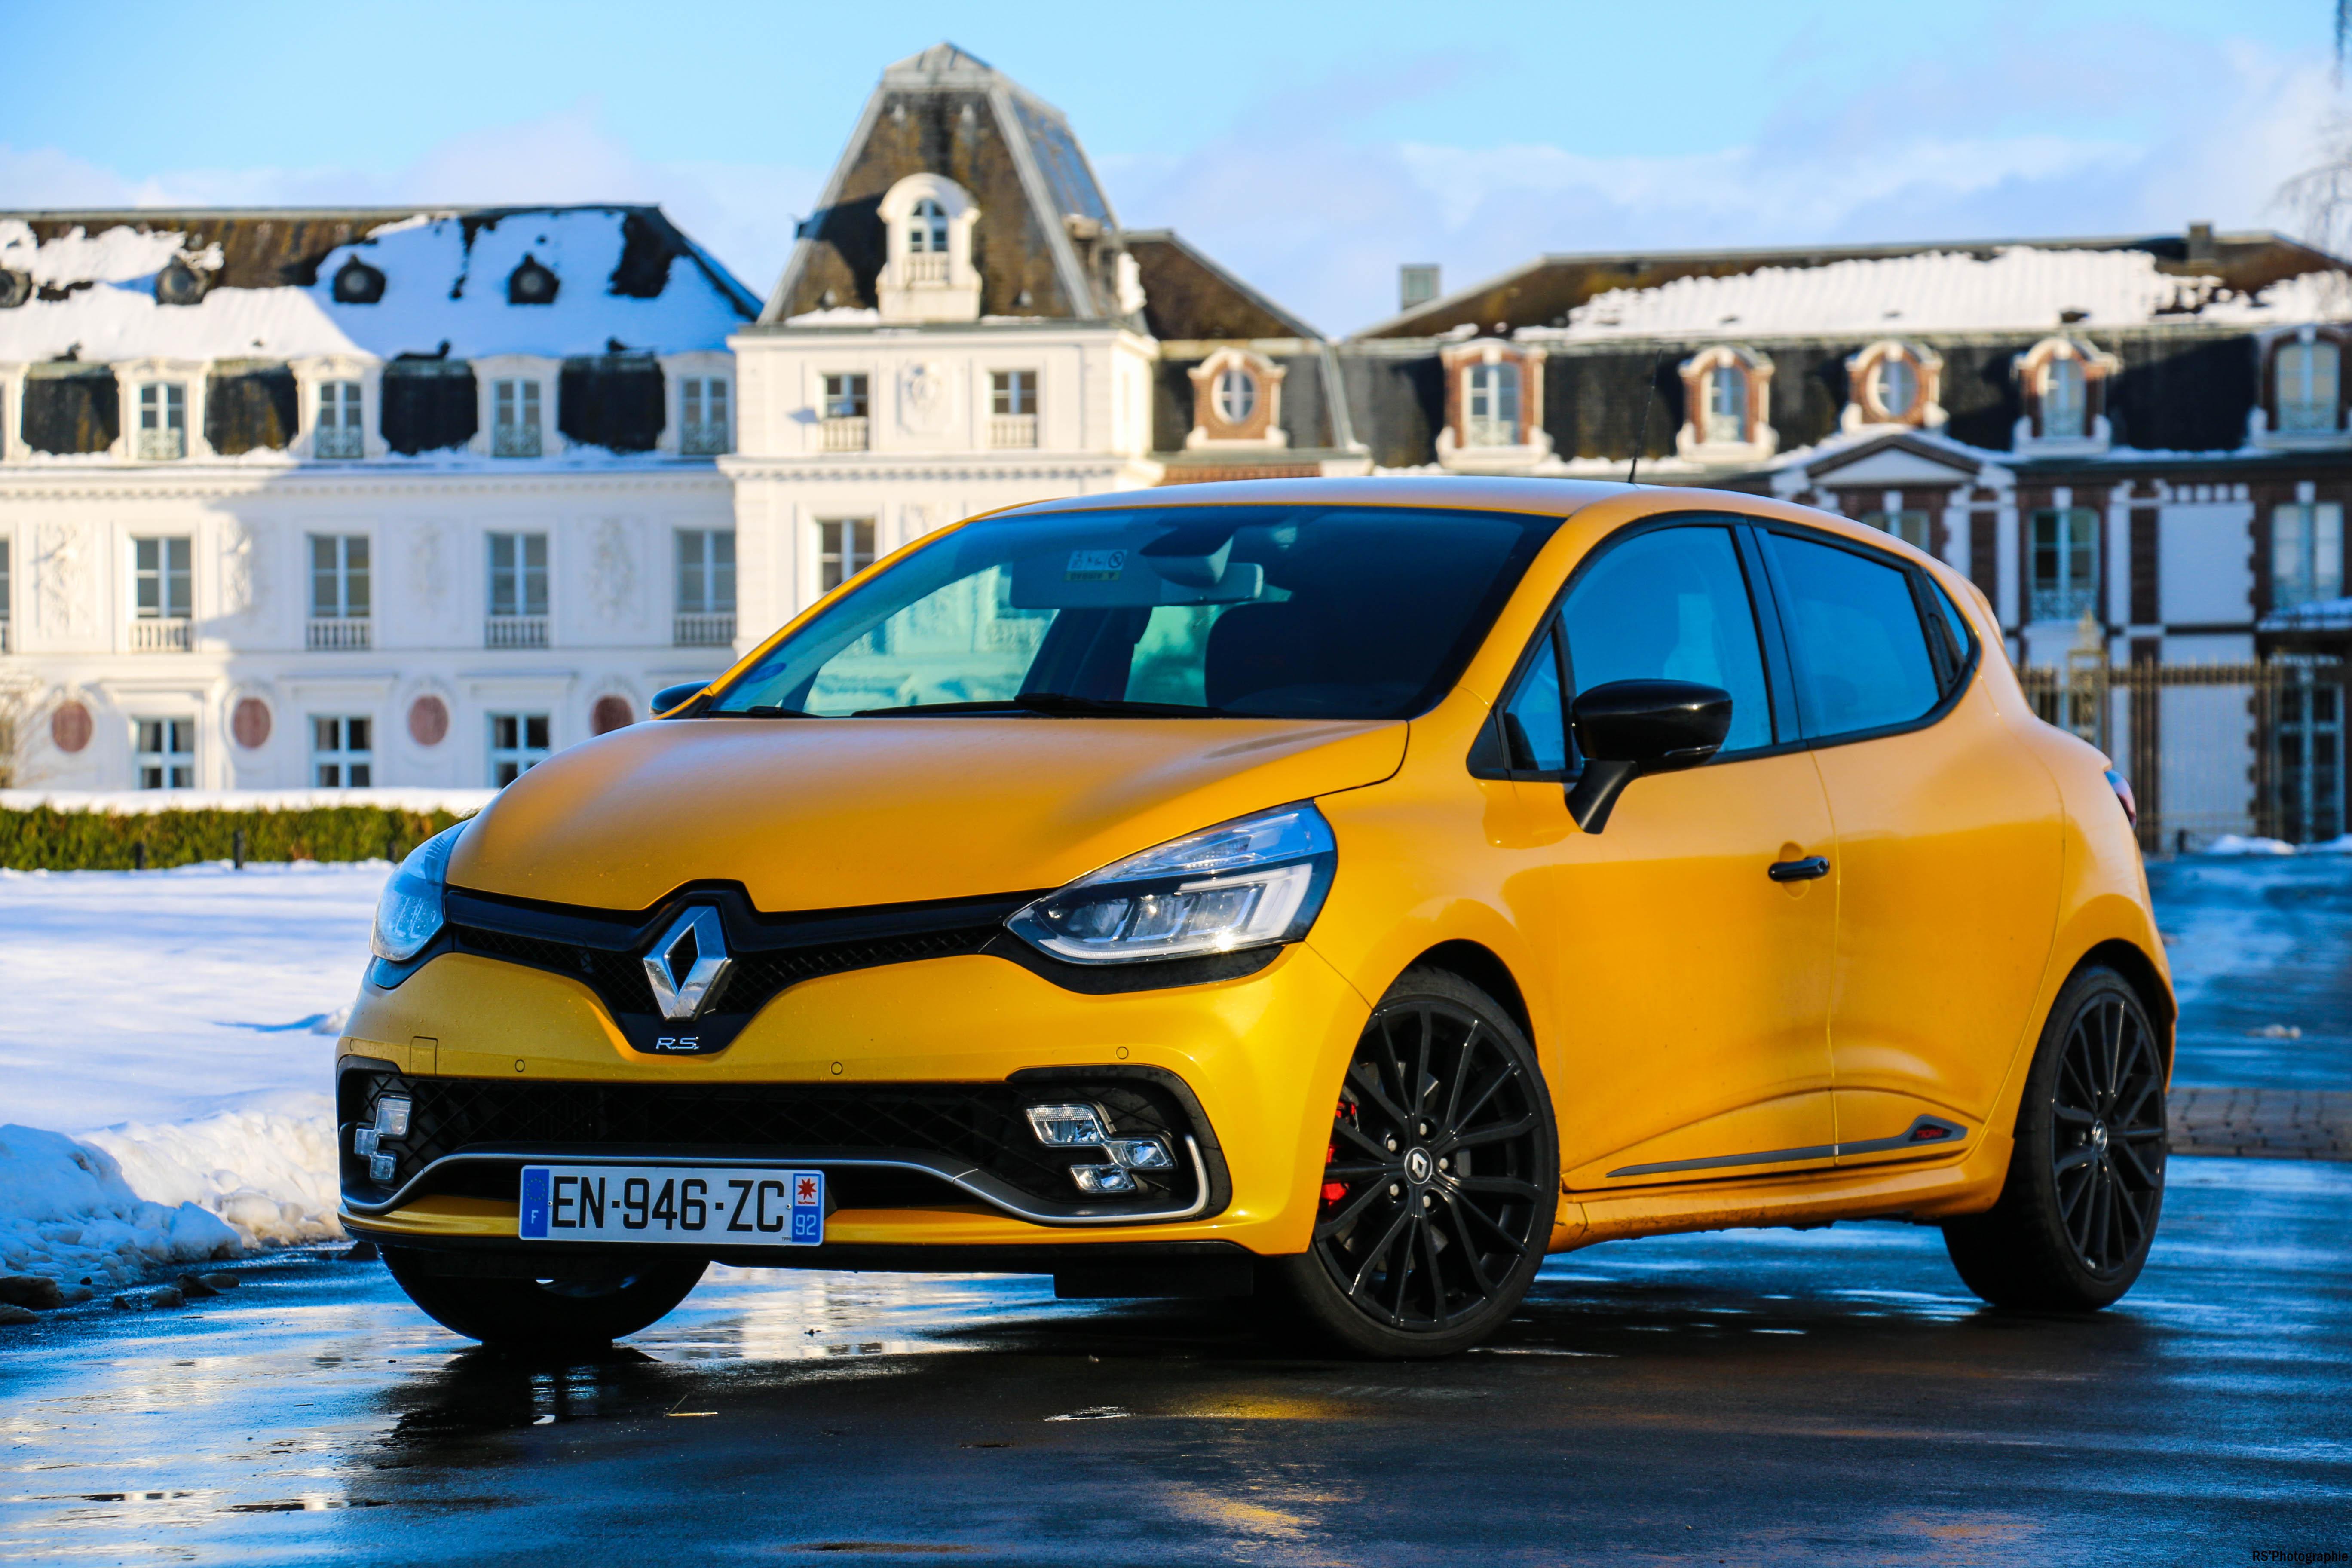 RenaultclioIVRSTrophy6-renault-clio-RS-trophy-avant-front-Arnaud Demasier-RSPhotographie